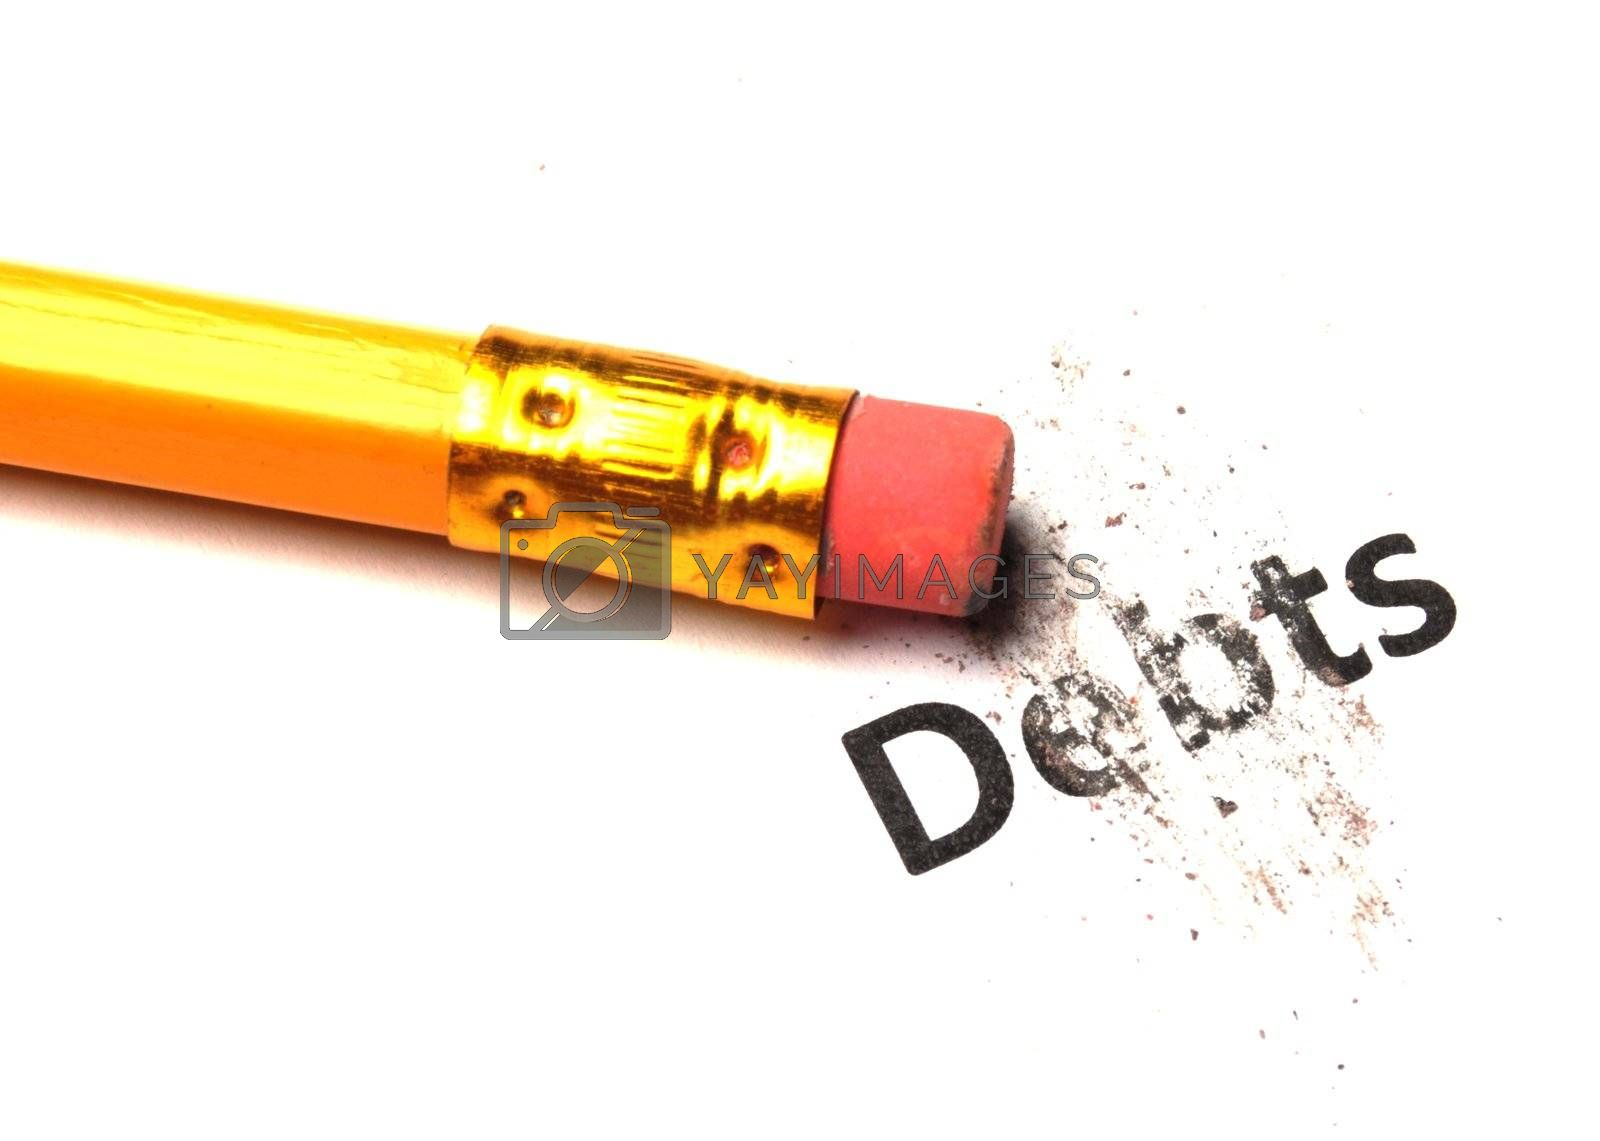 debt or debts concept with eraser showing finance or financial business problem concept